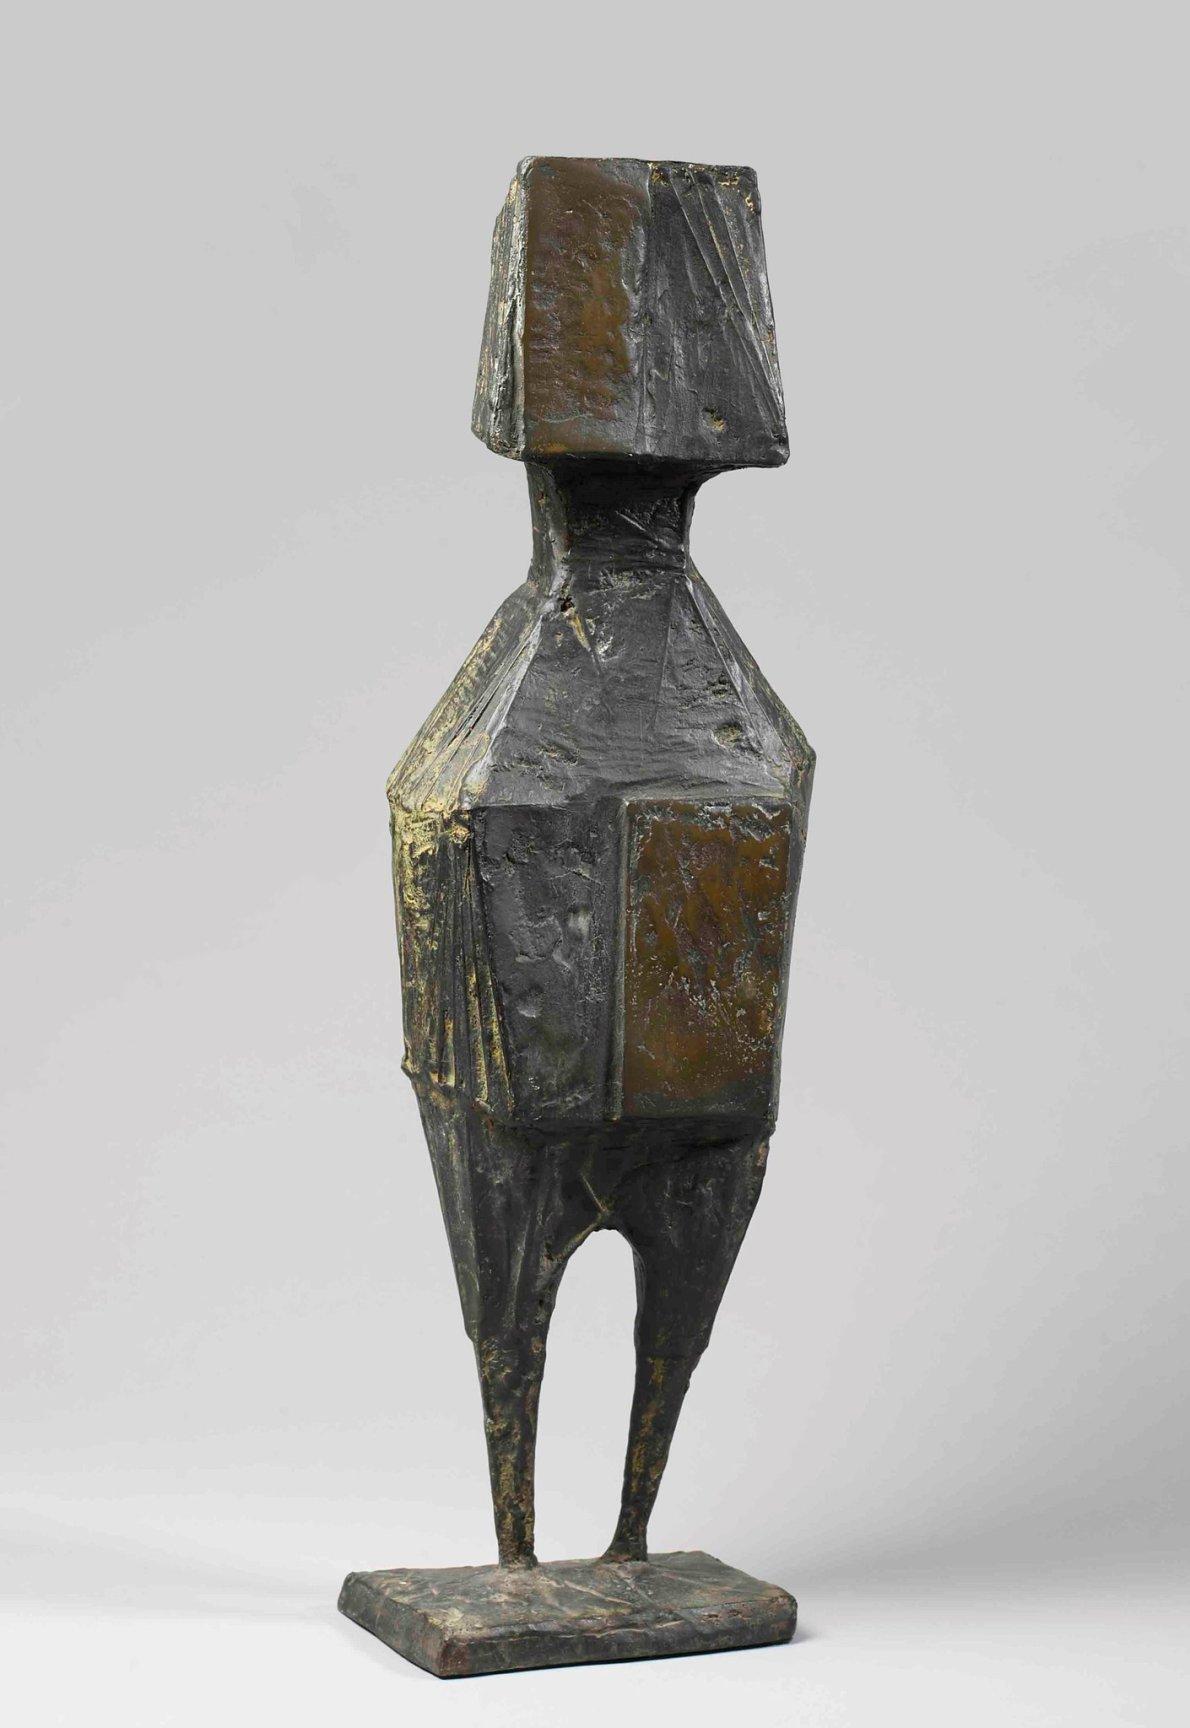 Lynn Chadwick, Folded Winged Figure, 1968